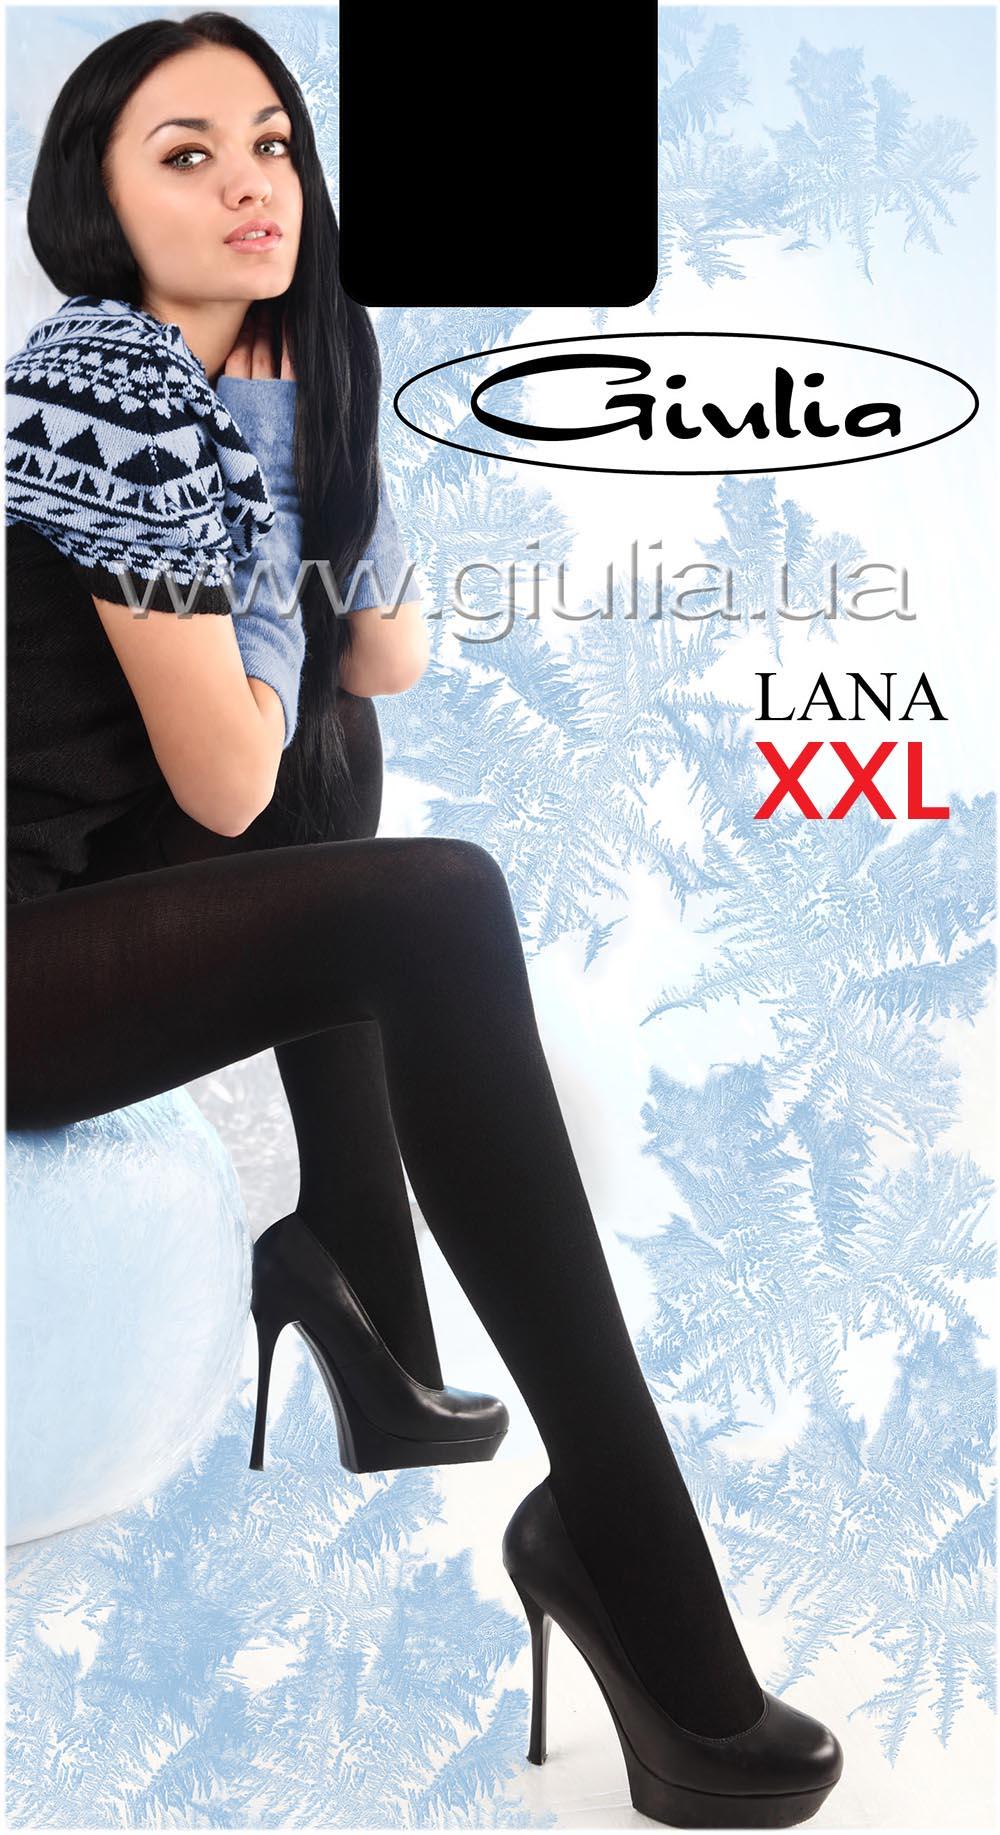 Теплые колготки LANA 150 XXL